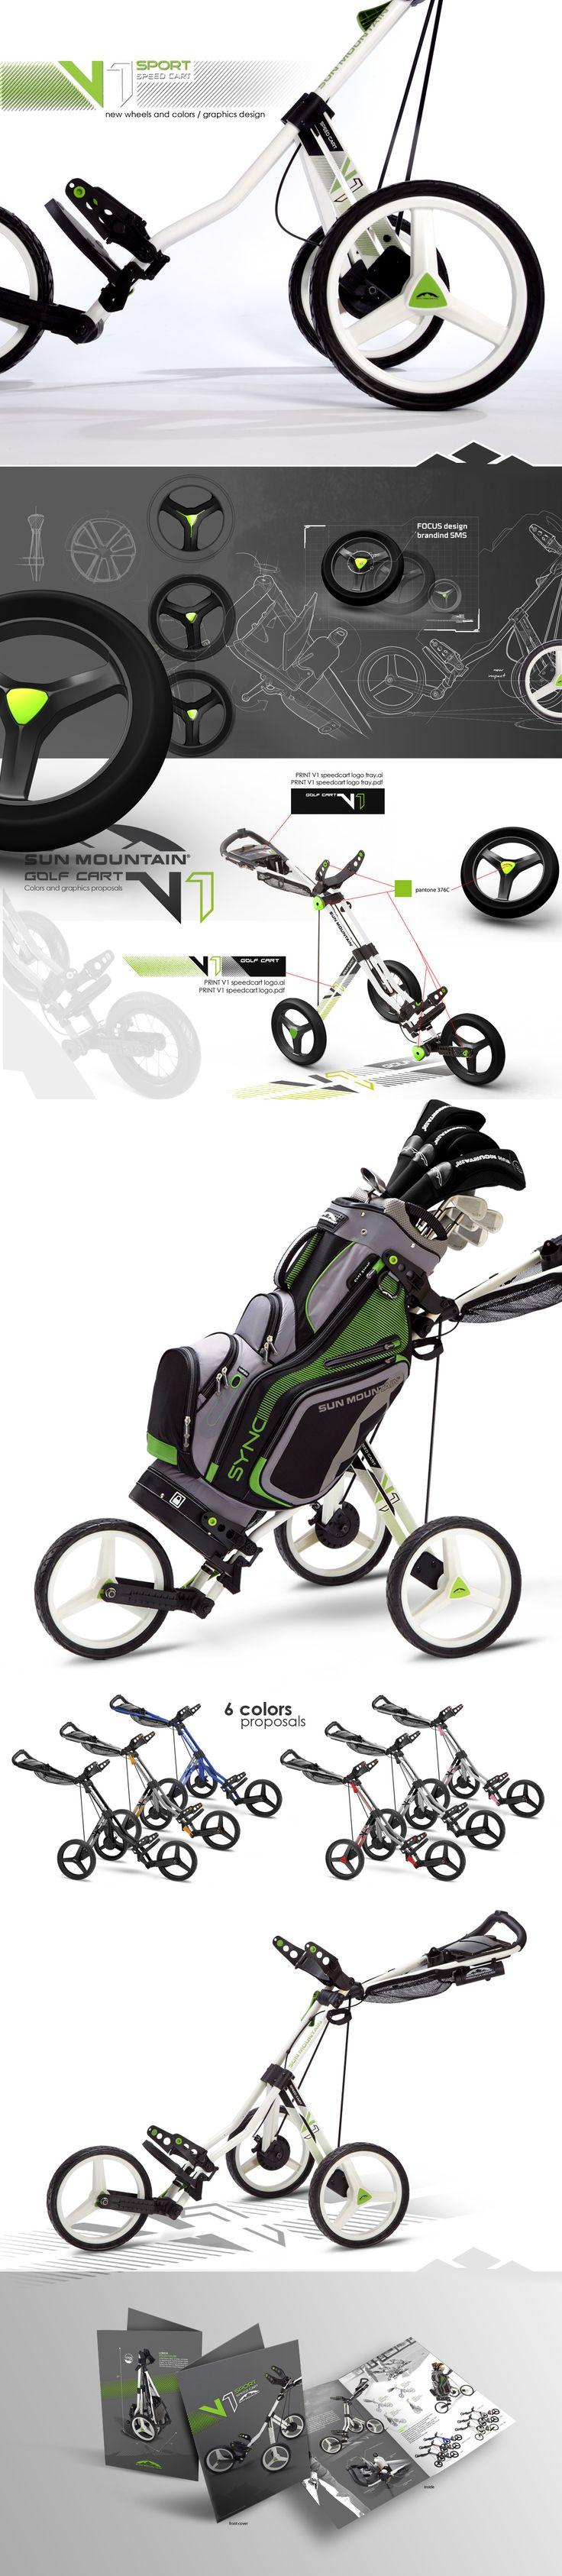 SUN MOUNTAIN V1 SPORT Golf Cart